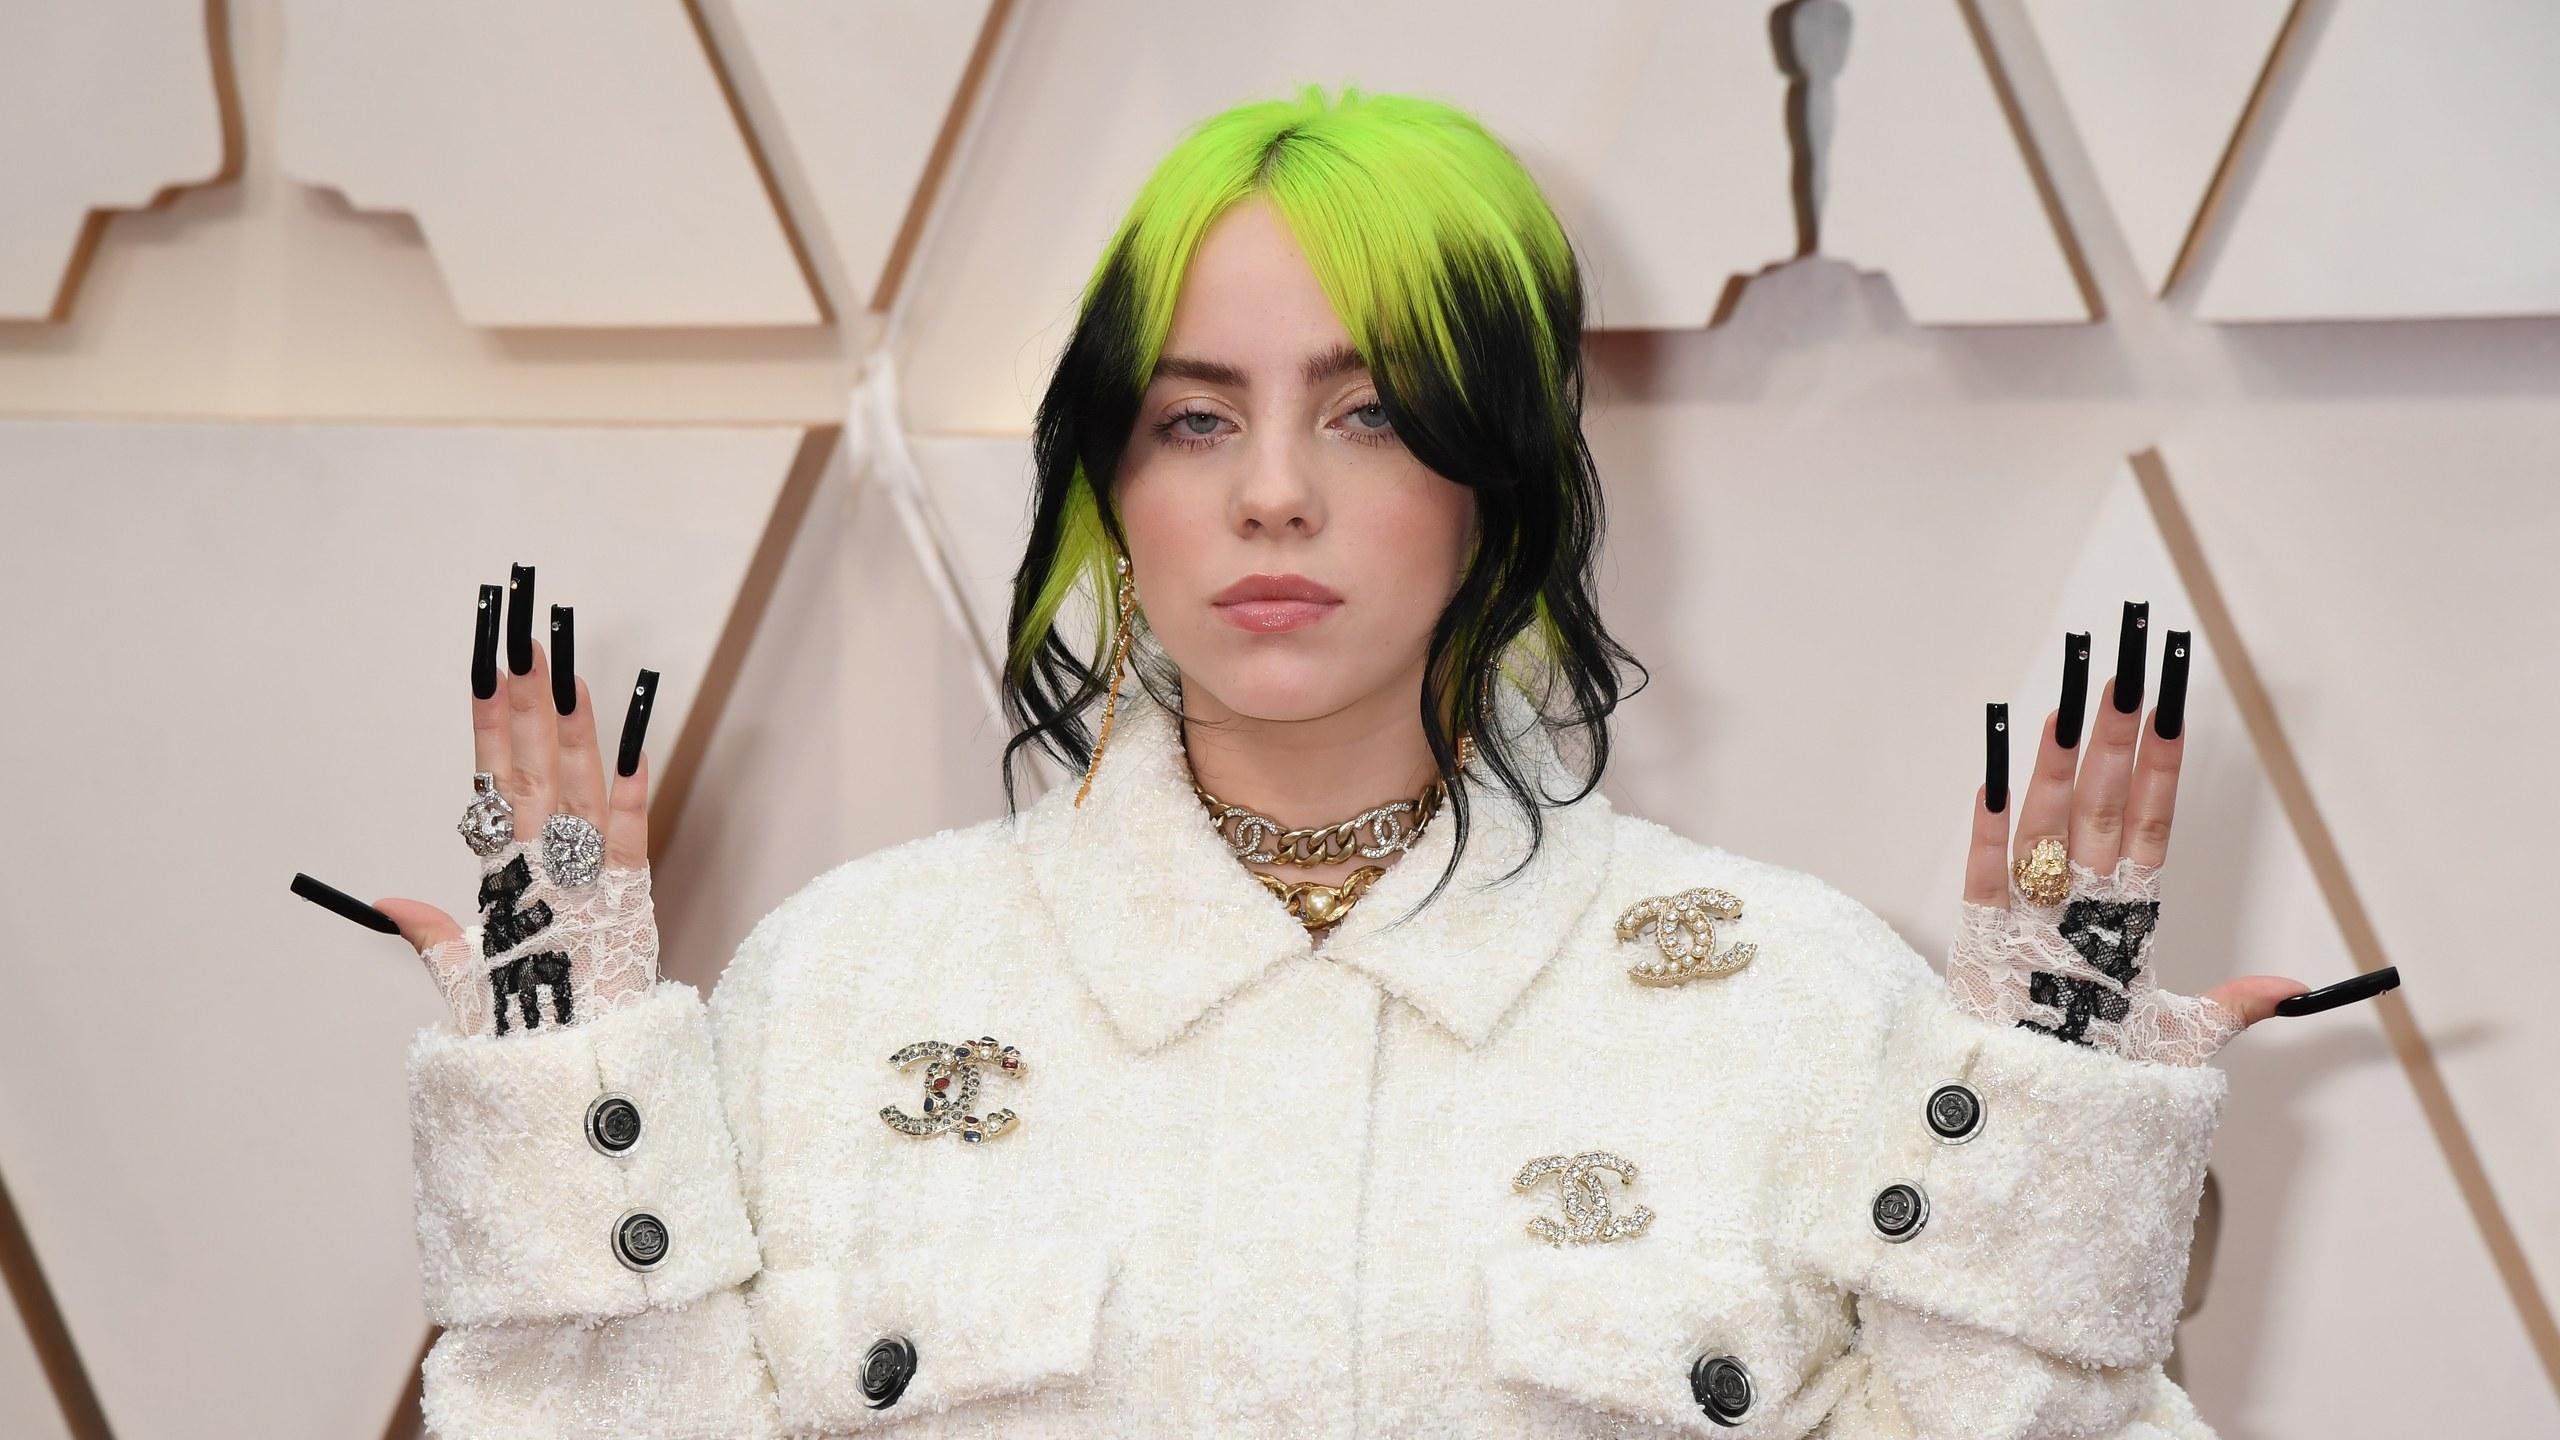 Oscars 2020 Billie Eilish Wears All Chanel and Black Jeweled Nail 2560x1440